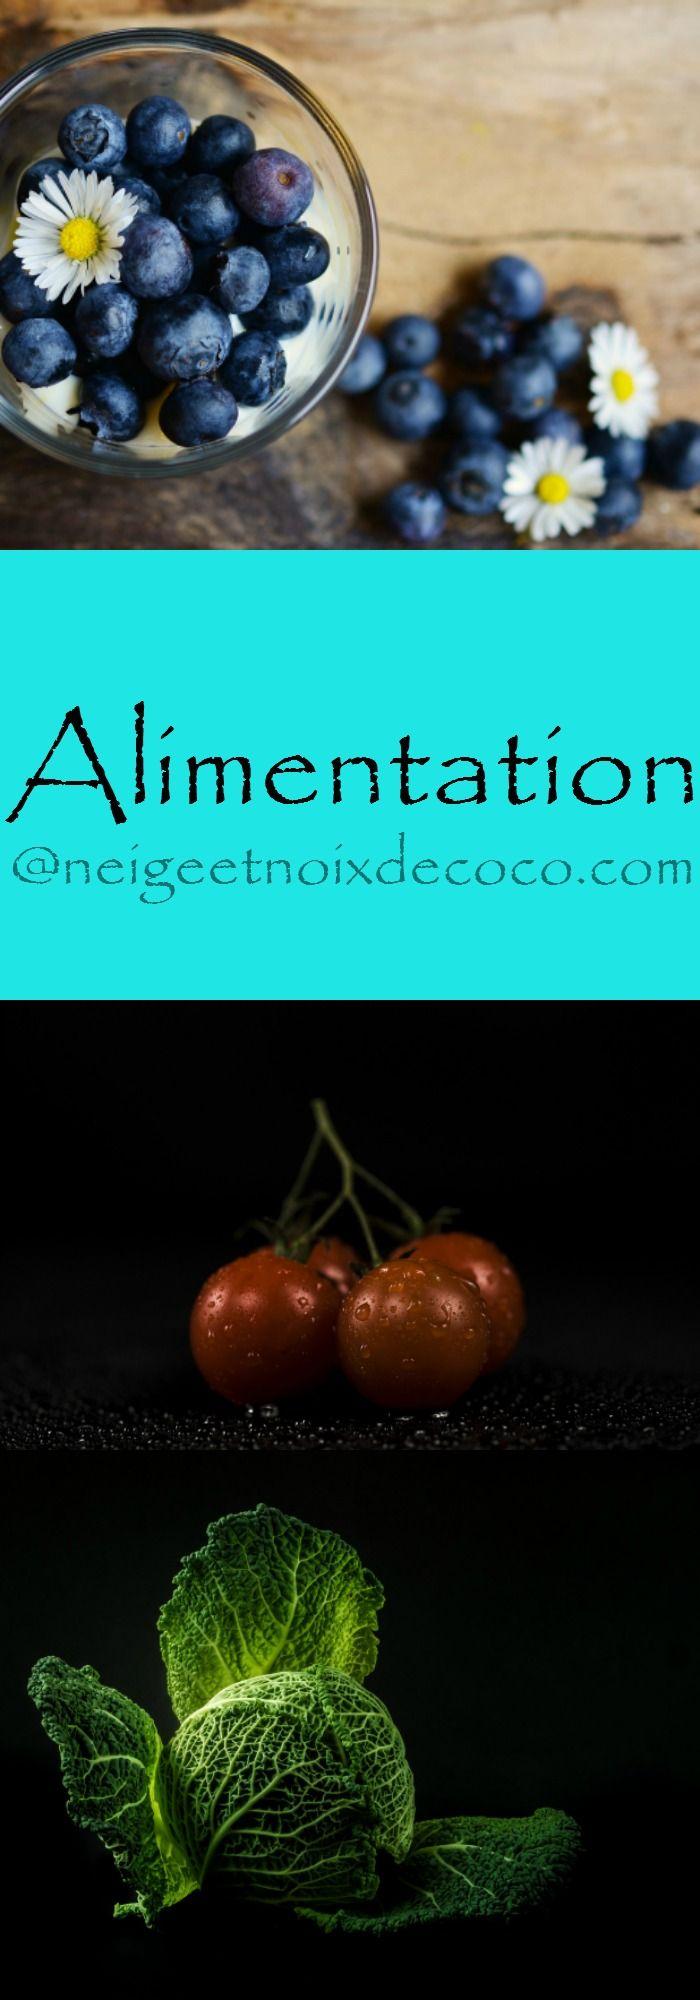 Alimentation@neigeetnoixdecoco.com